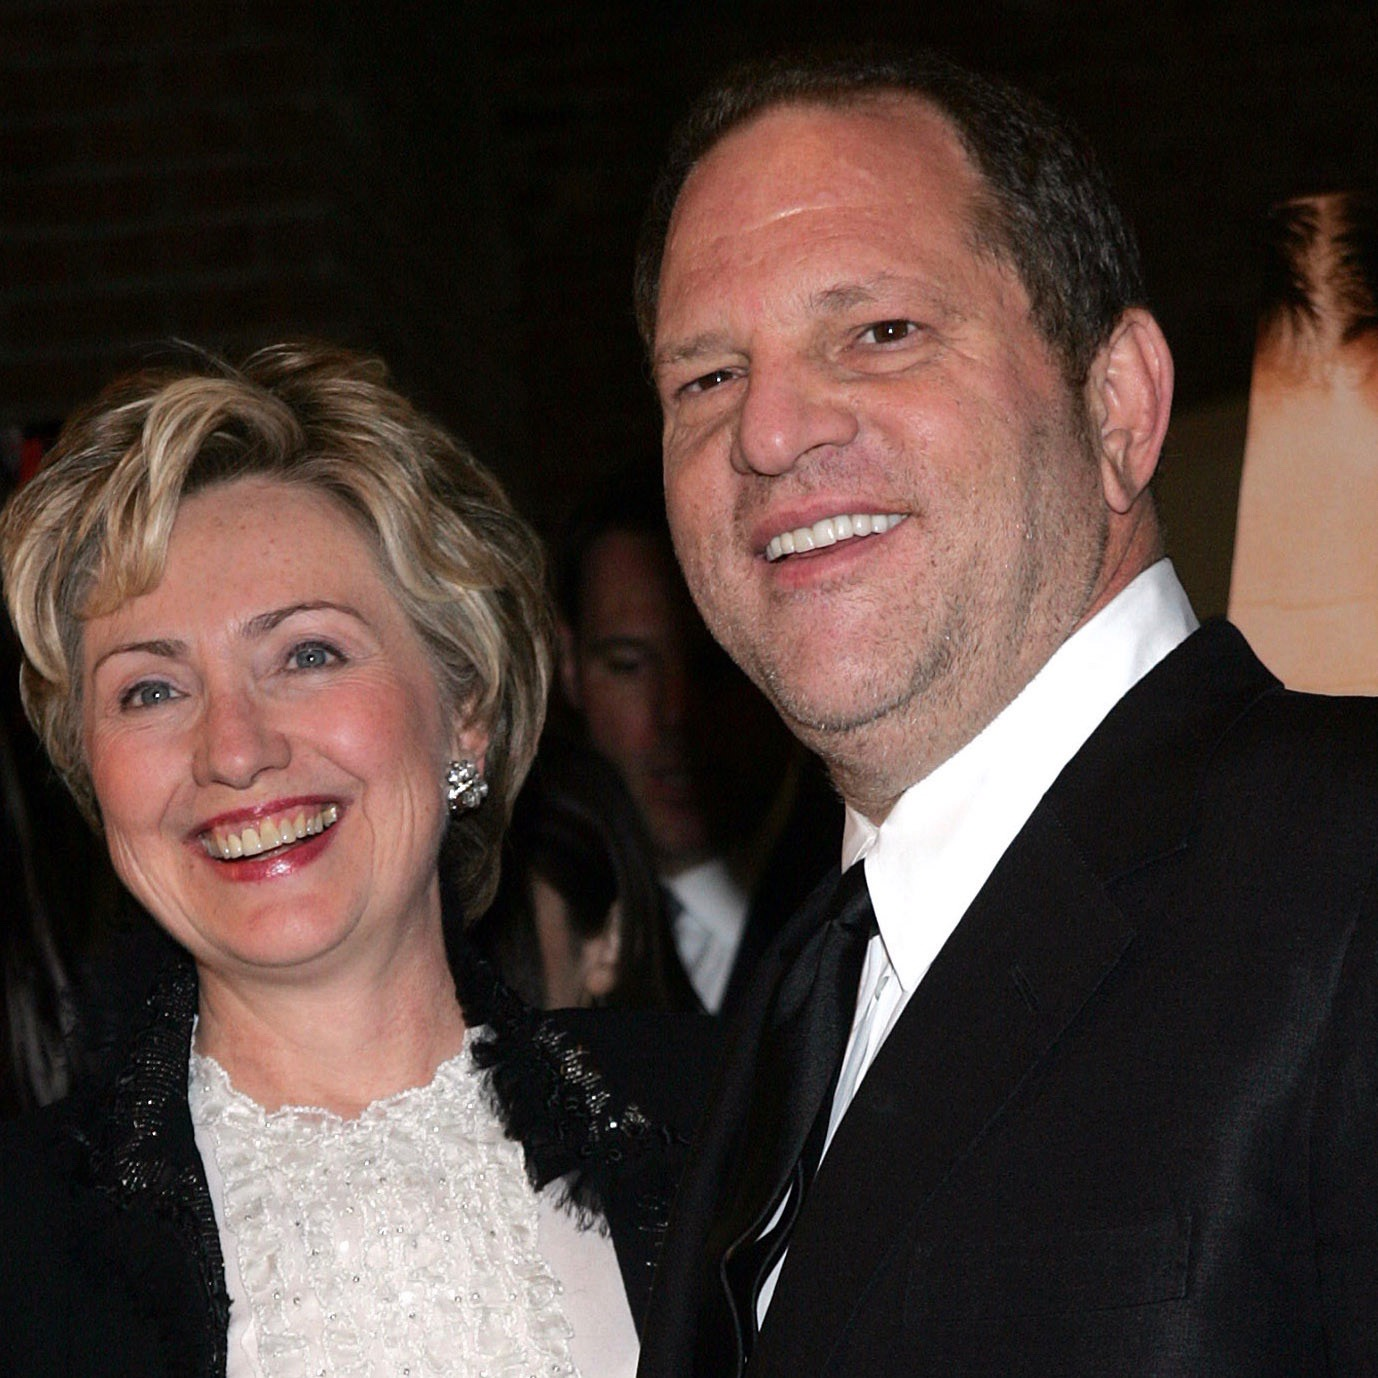 SHAME! Democrats Go Into Hiding After Harvey Weinstein Sexual Assault Revelations [VIDEO]